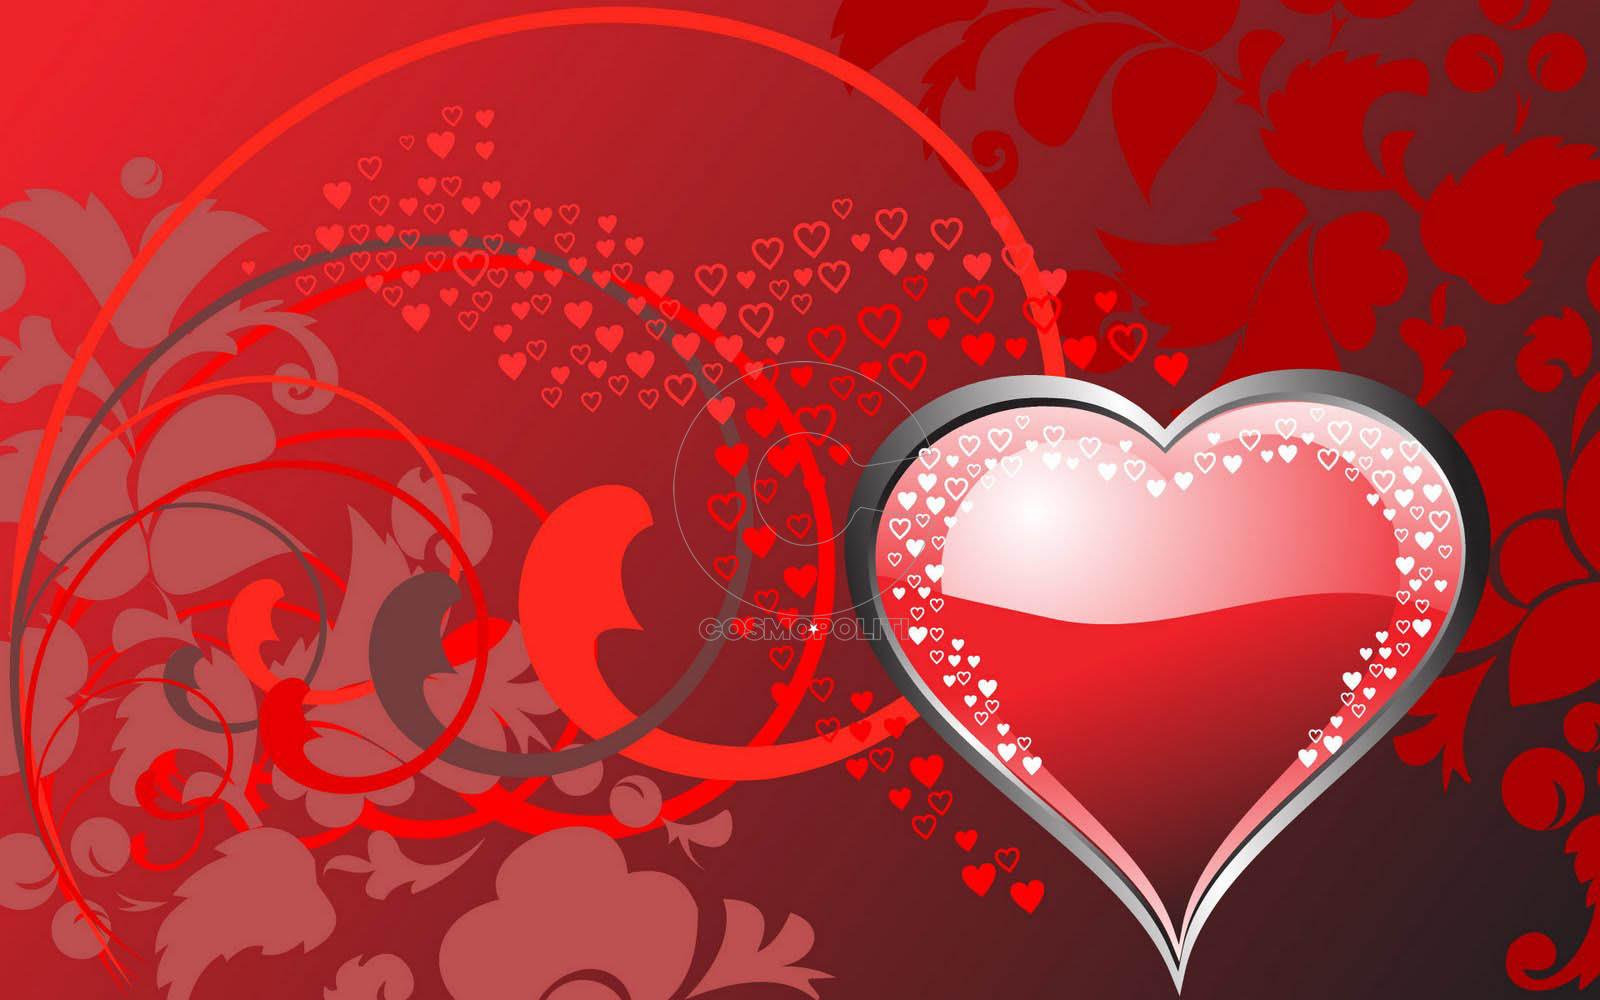 219-2199342_beautiful-love-heart-wallpaper-hd-pics-one-hd